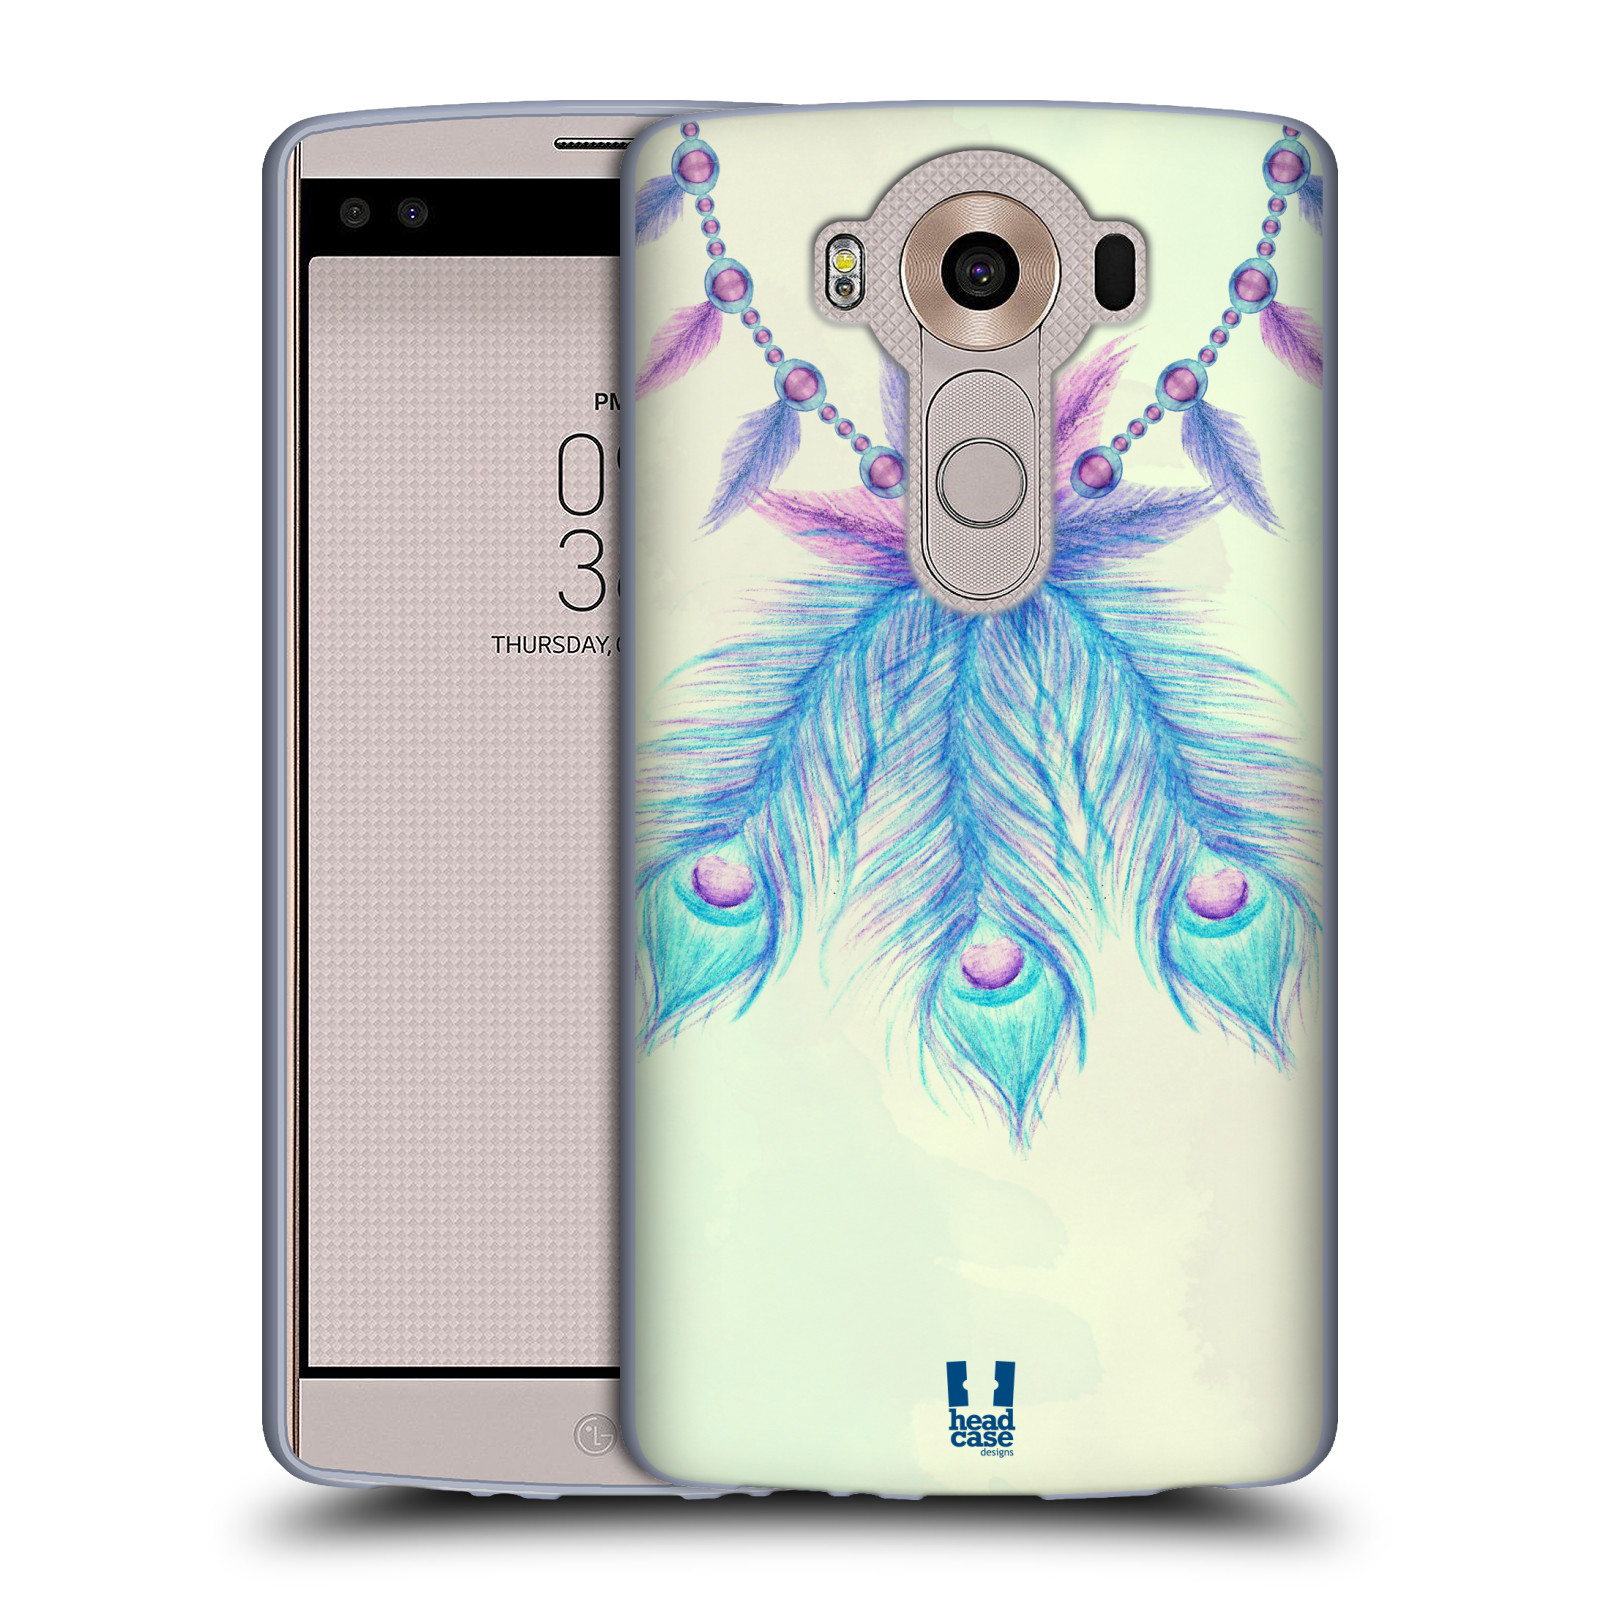 HEAD CASE silikonový obal na mobil LG V10 (H960A) vzor Paví pírka barevná MODRÁ ŠTĚSTÍ